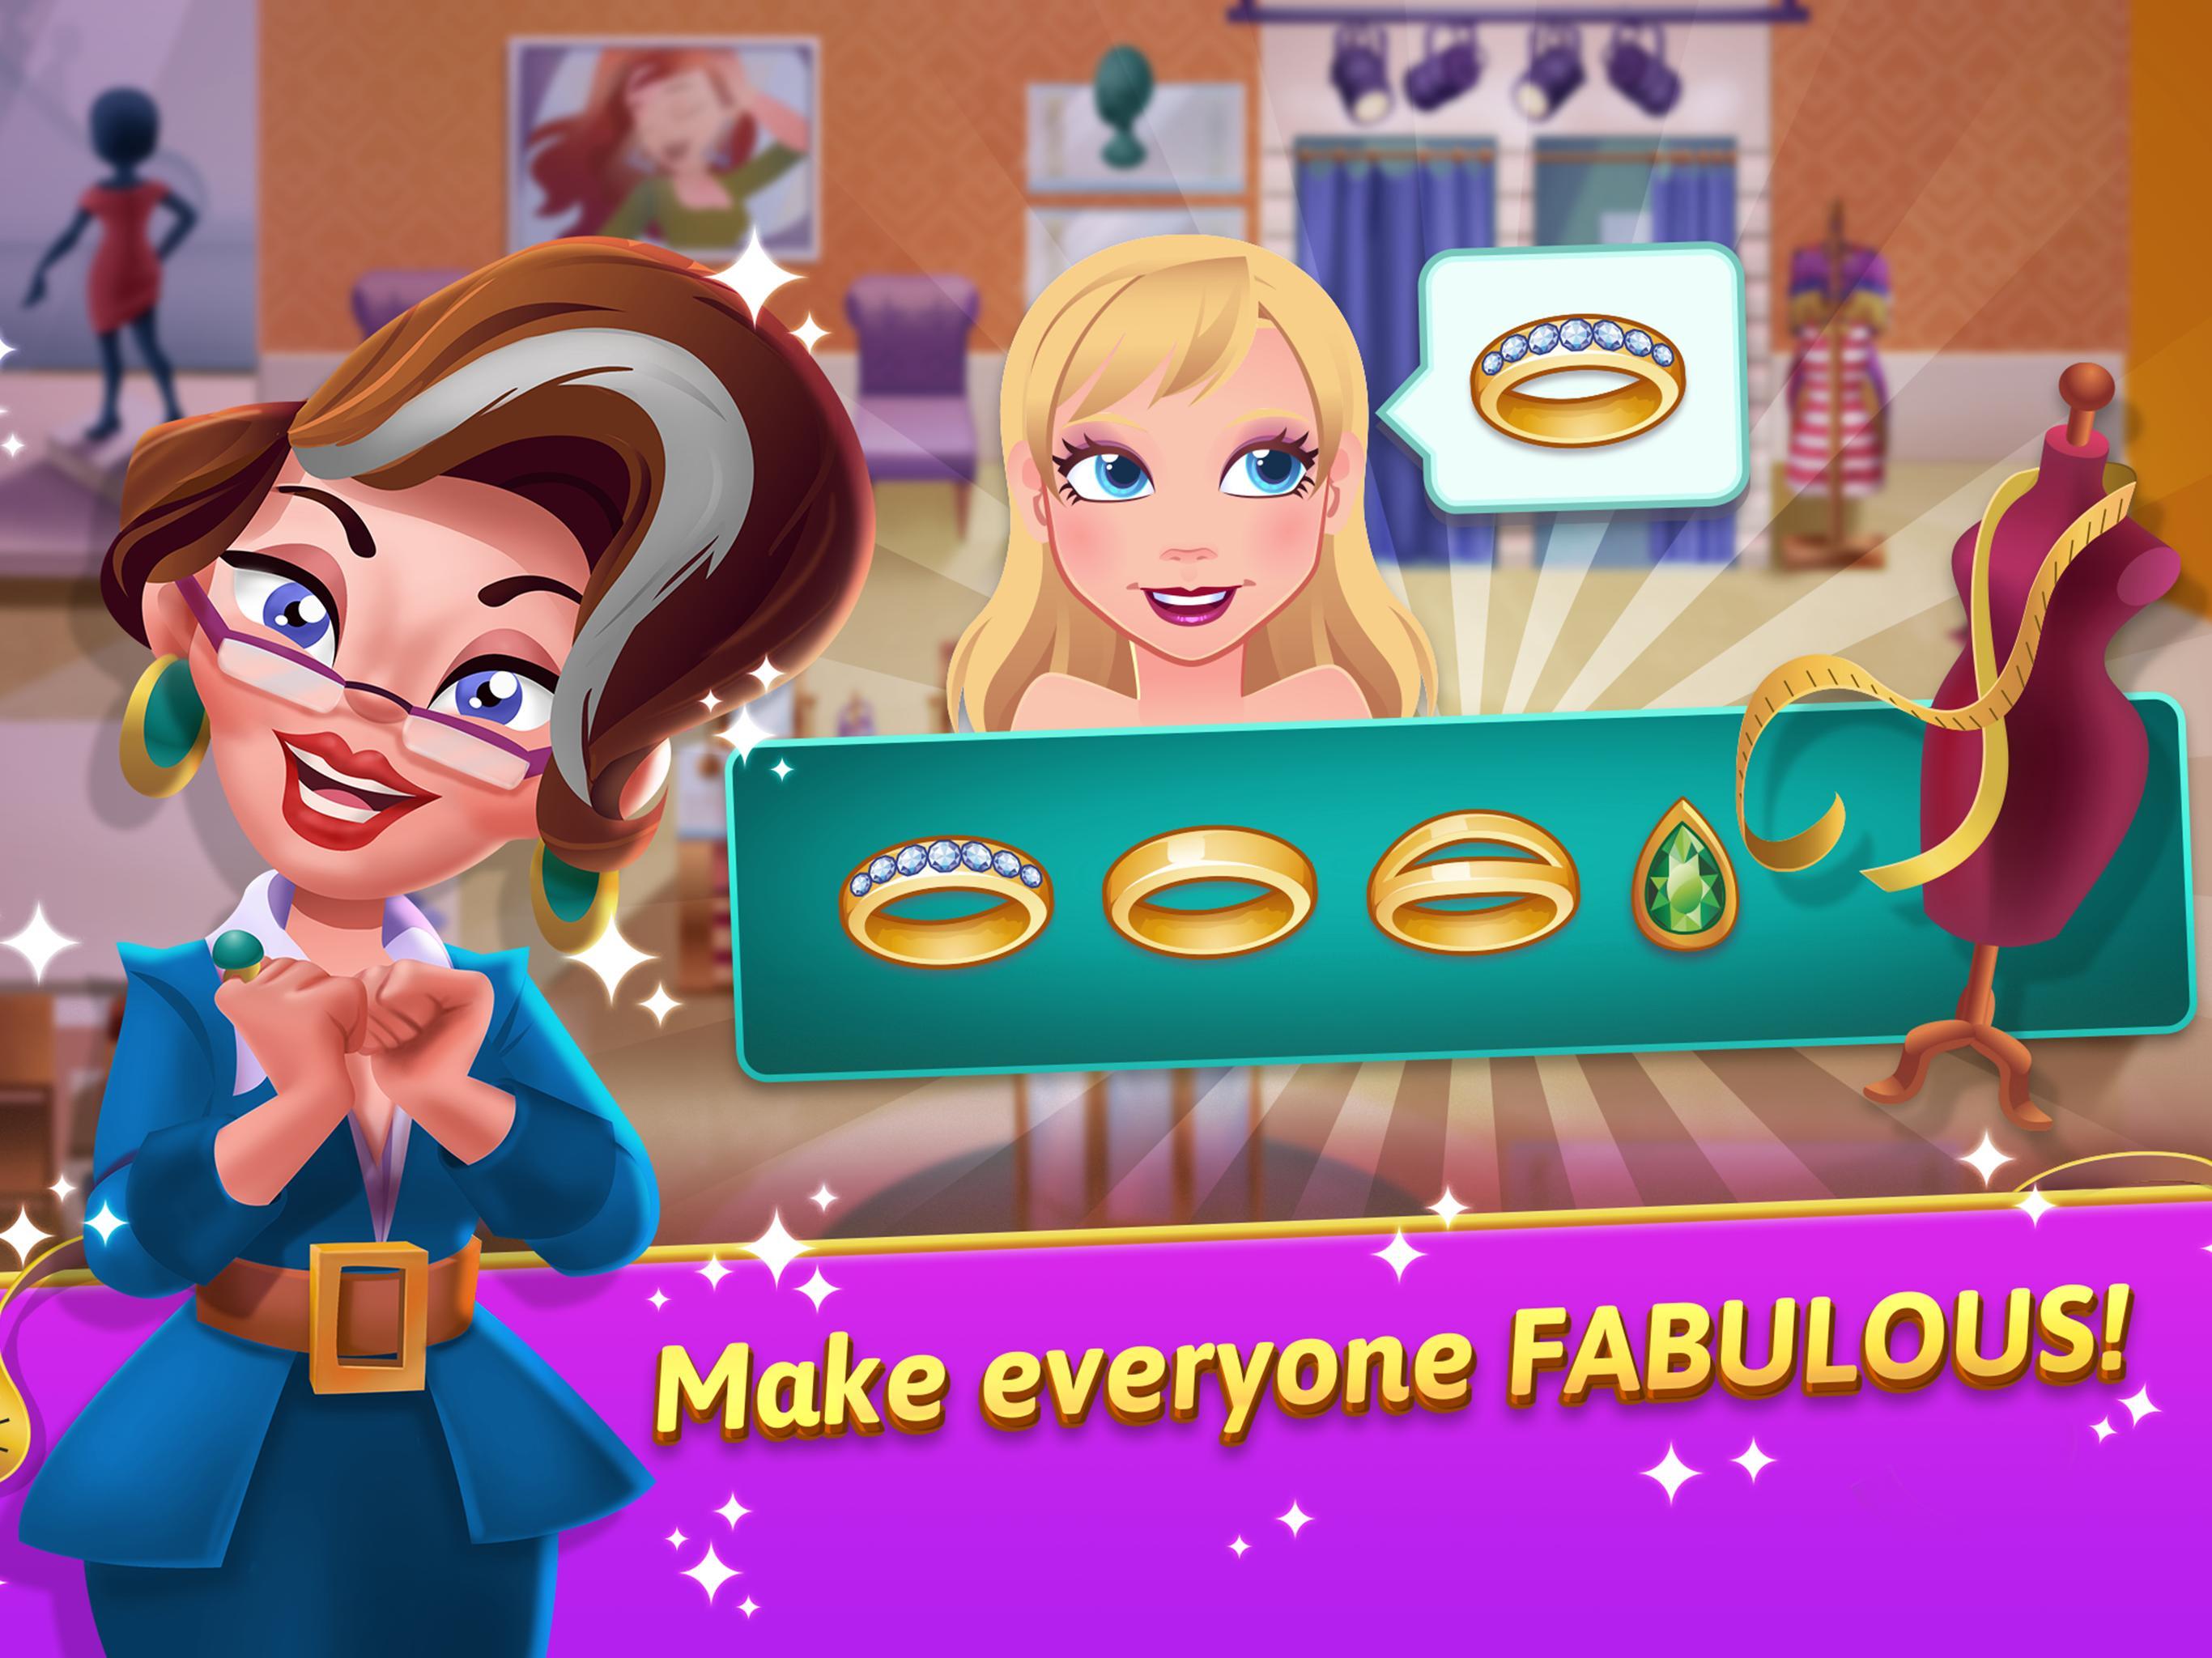 Fashion Salon Dash Fashion Shop Simulator Game For Android Apk